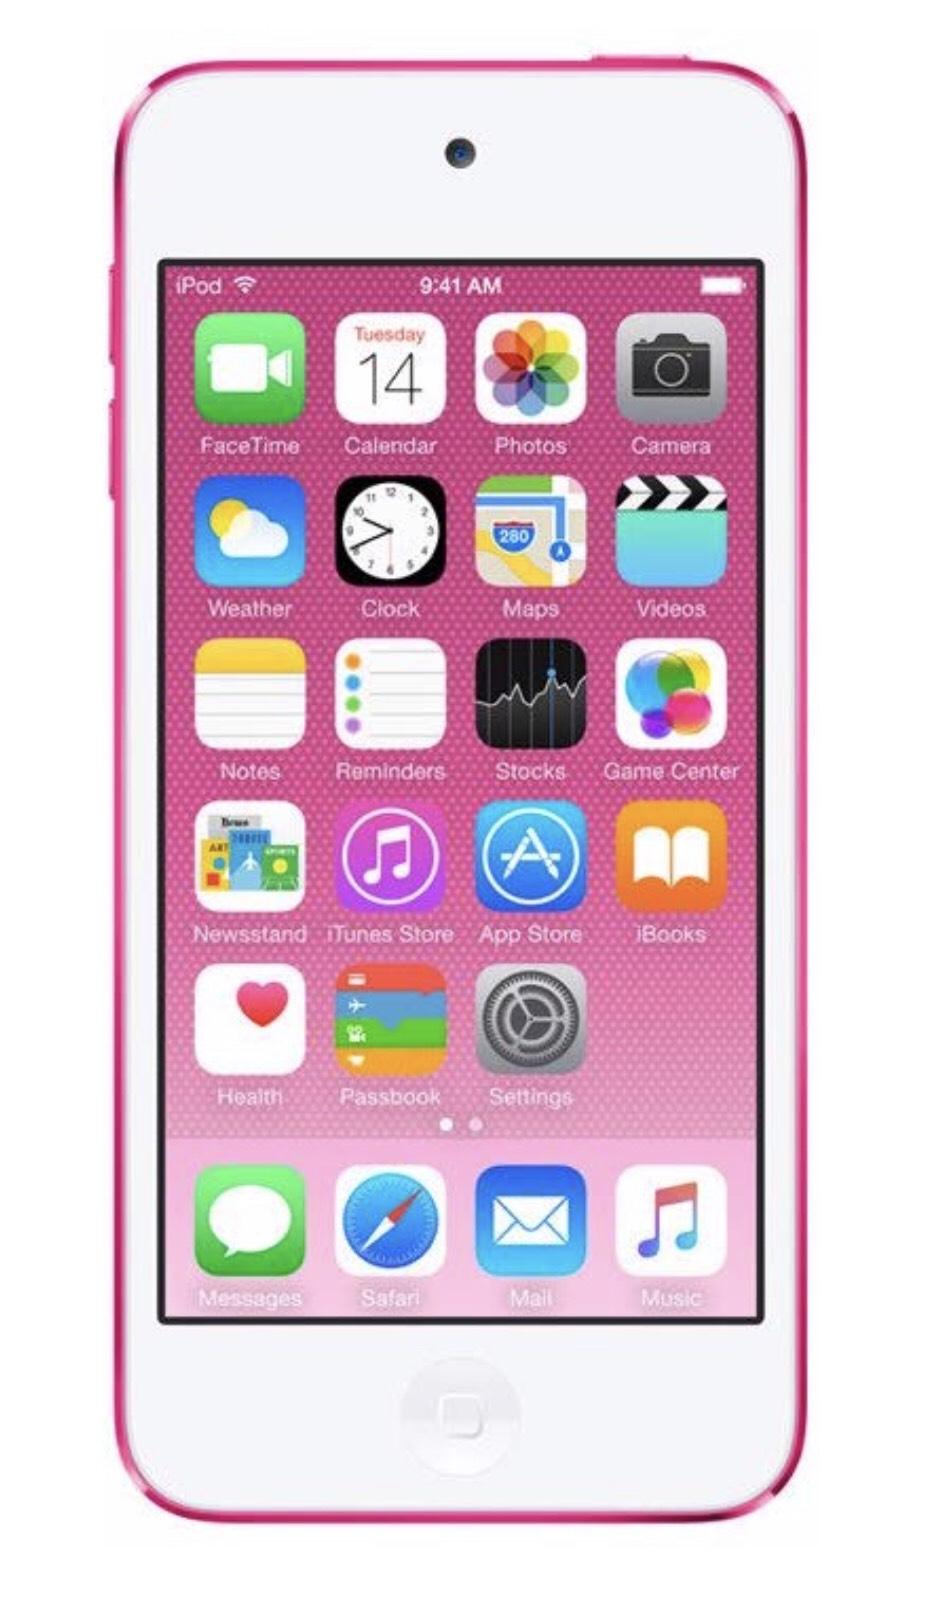 APPLE MKHQ2FD/A iPod touch iPod touch (32 GB, Pink) MediaMarkt/ eBay/ amazon